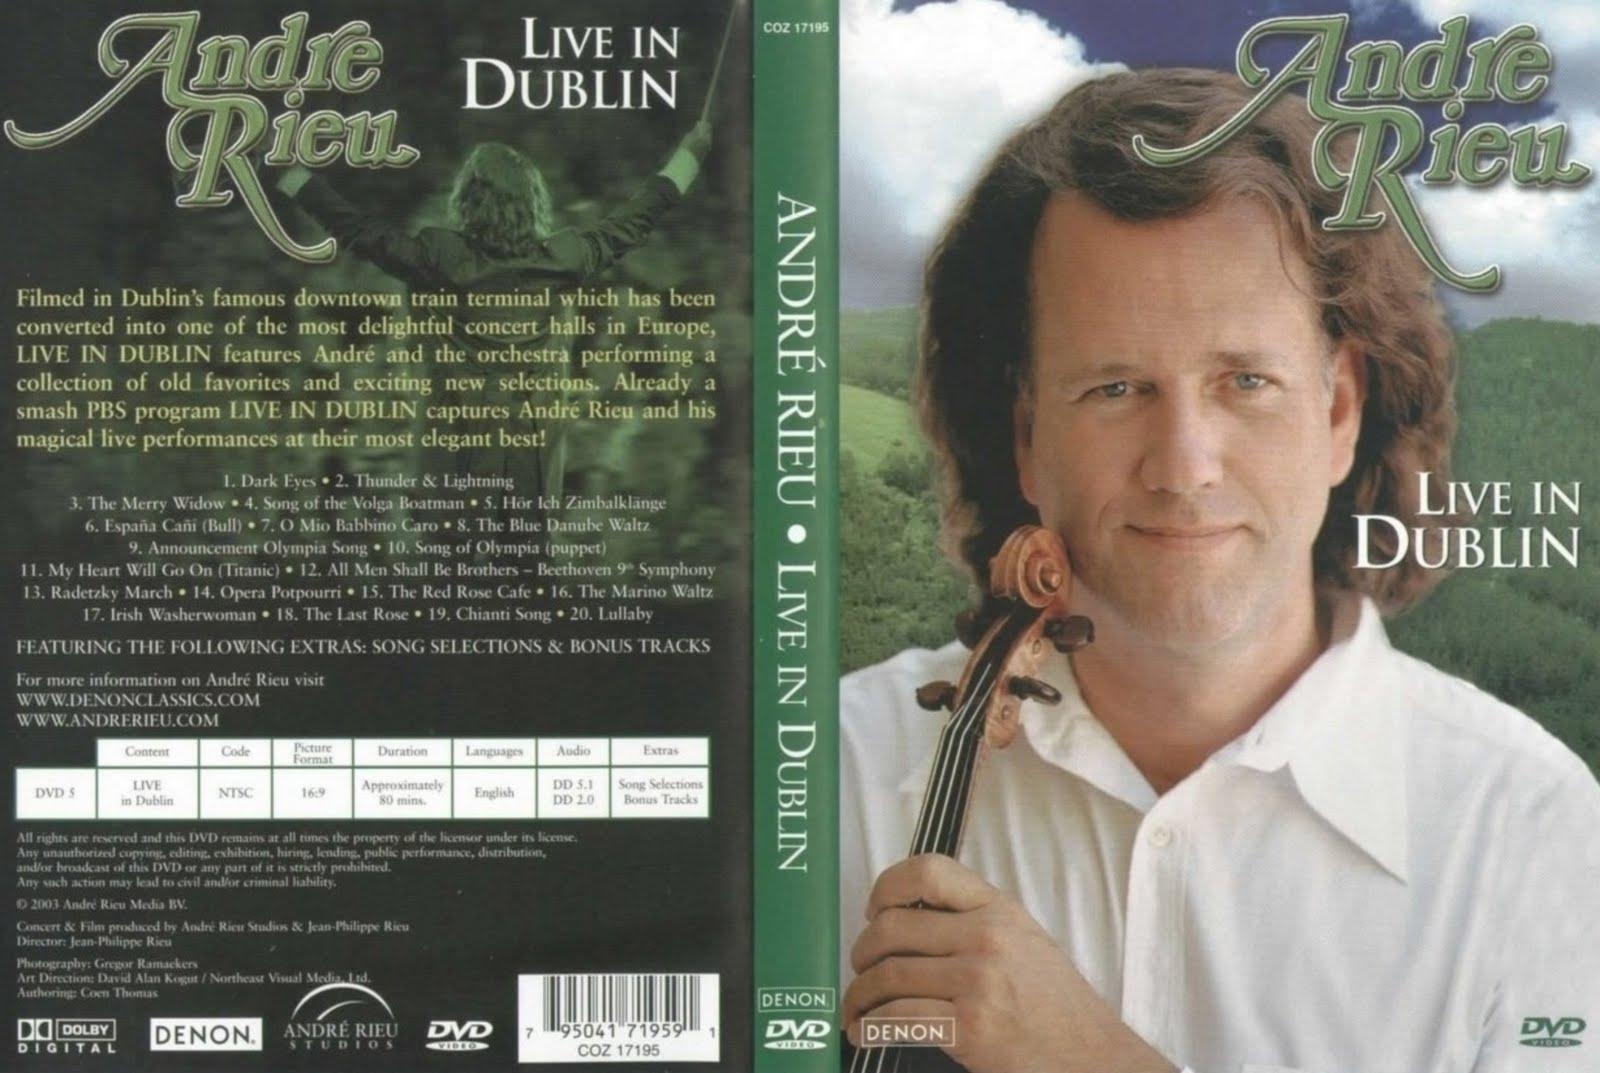 http://2.bp.blogspot.com/_se0zHB8H7oU/S_L8rpwz-3I/AAAAAAAACZg/1zIq5RYJj-c/s1600/Andre+Rieu+-+Live+In+Dublin+-+Cover.jpg